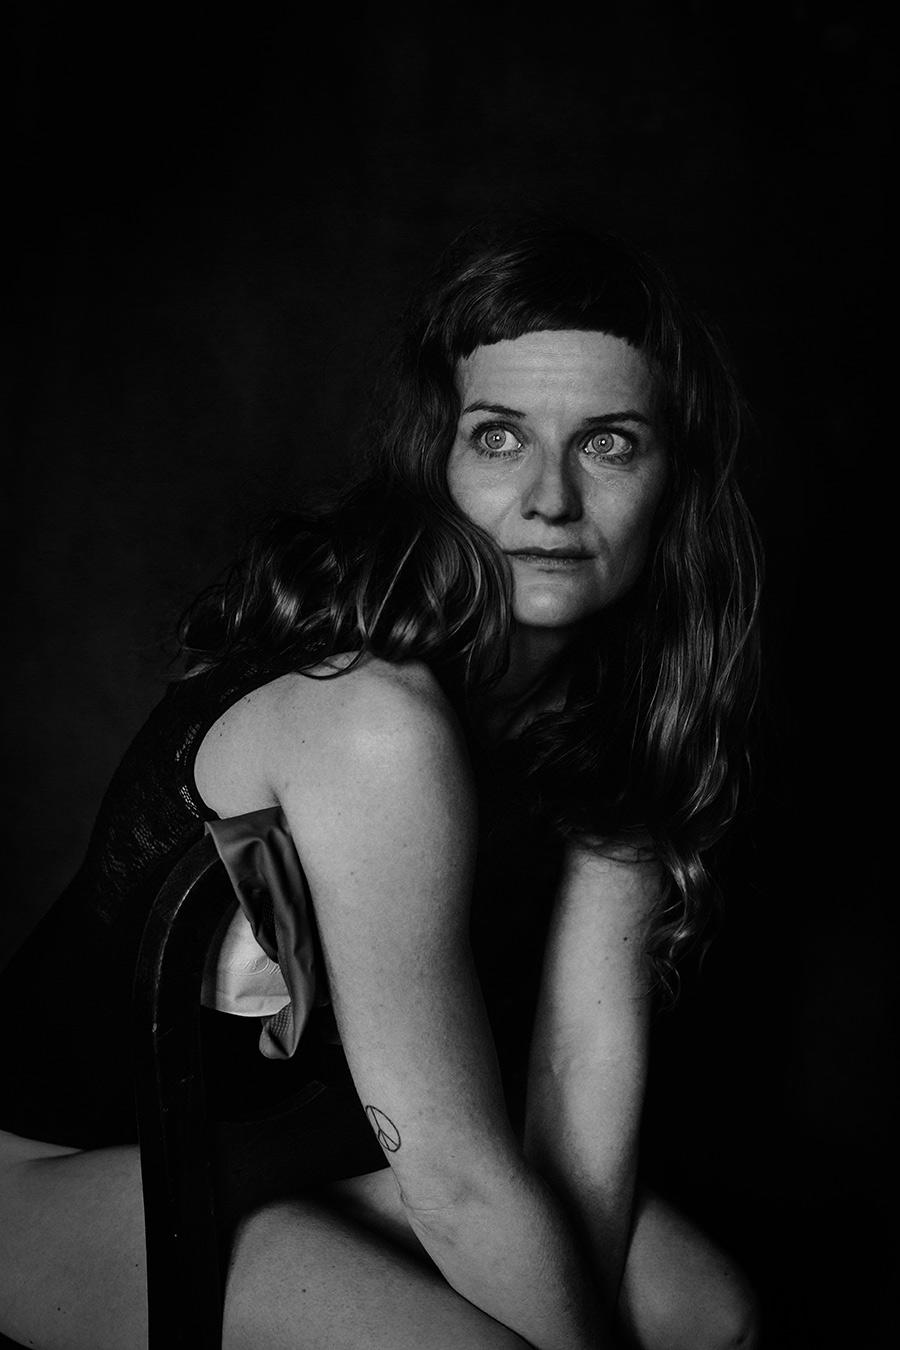 Fotografie Antje Kroeger